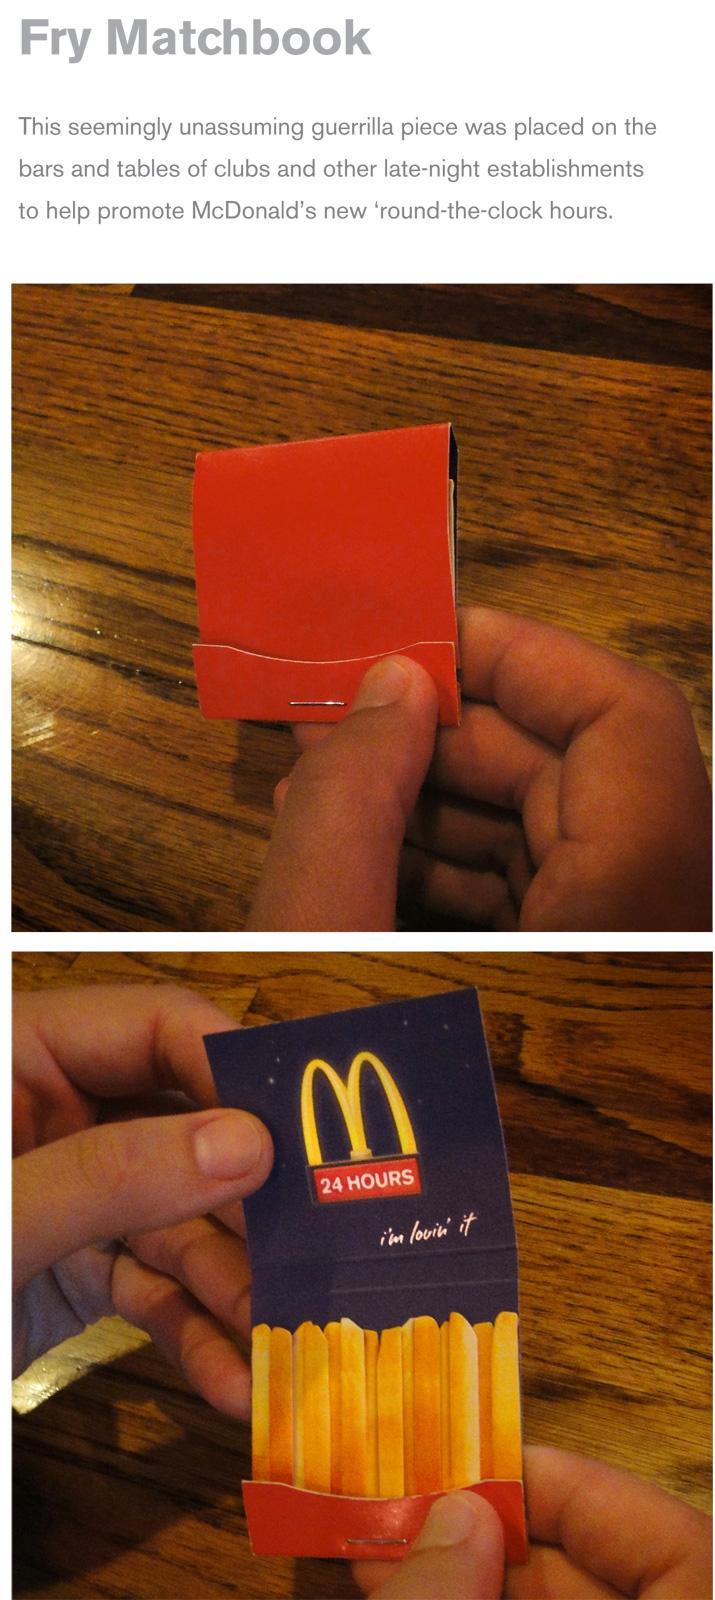 McDonald's Direct Ad -  Fry Matchbook